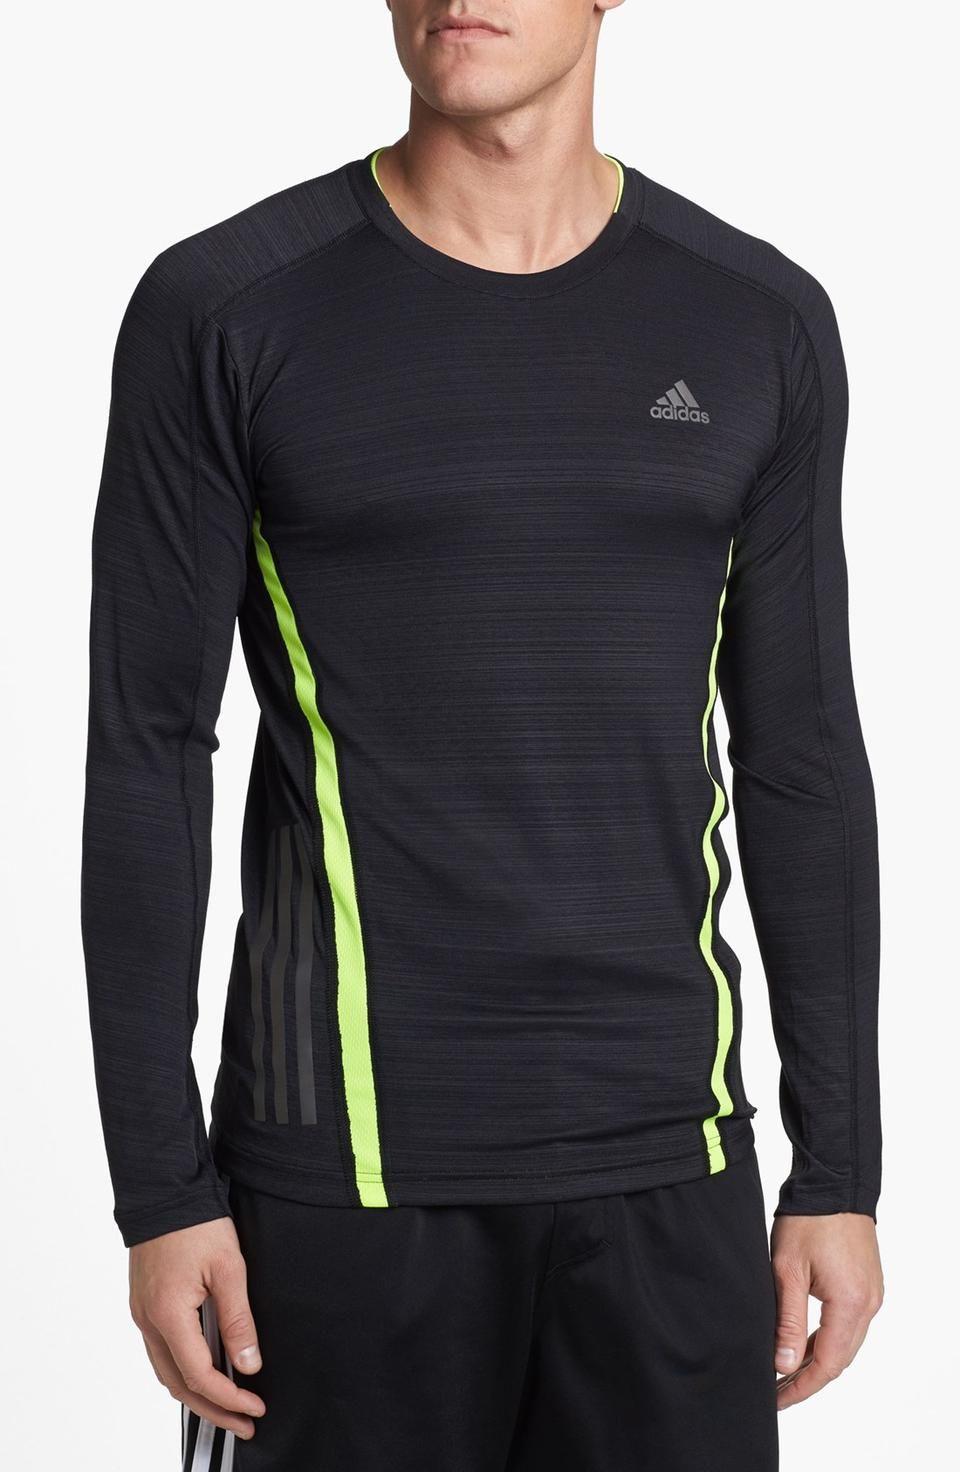 herida Adelante enlace  adidas 'Supernova' T-Shirt for $45 / Wantering | Ropa deportiva para  hombre, Camisetas deportivas, Ropa de hombre